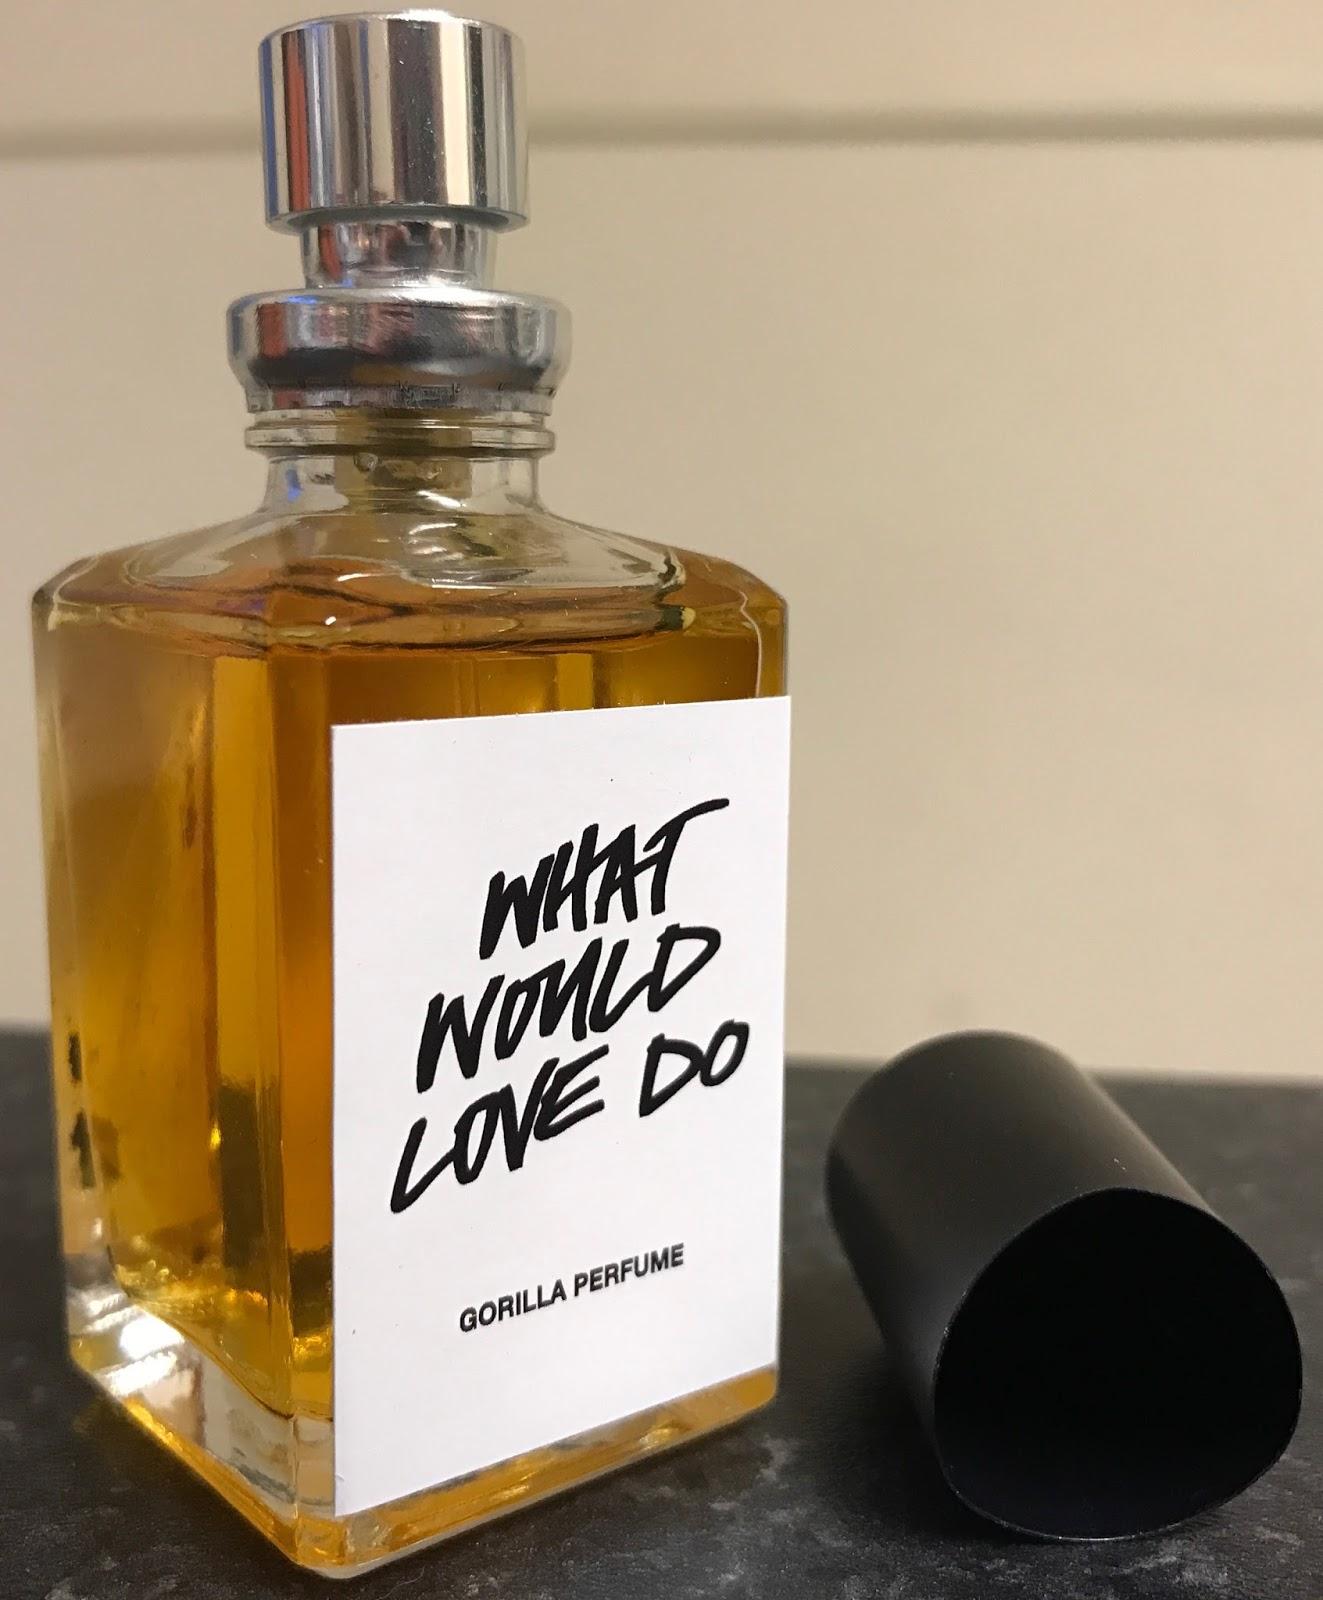 All Things Lush UK: What Would Love Do Liquid Perfume